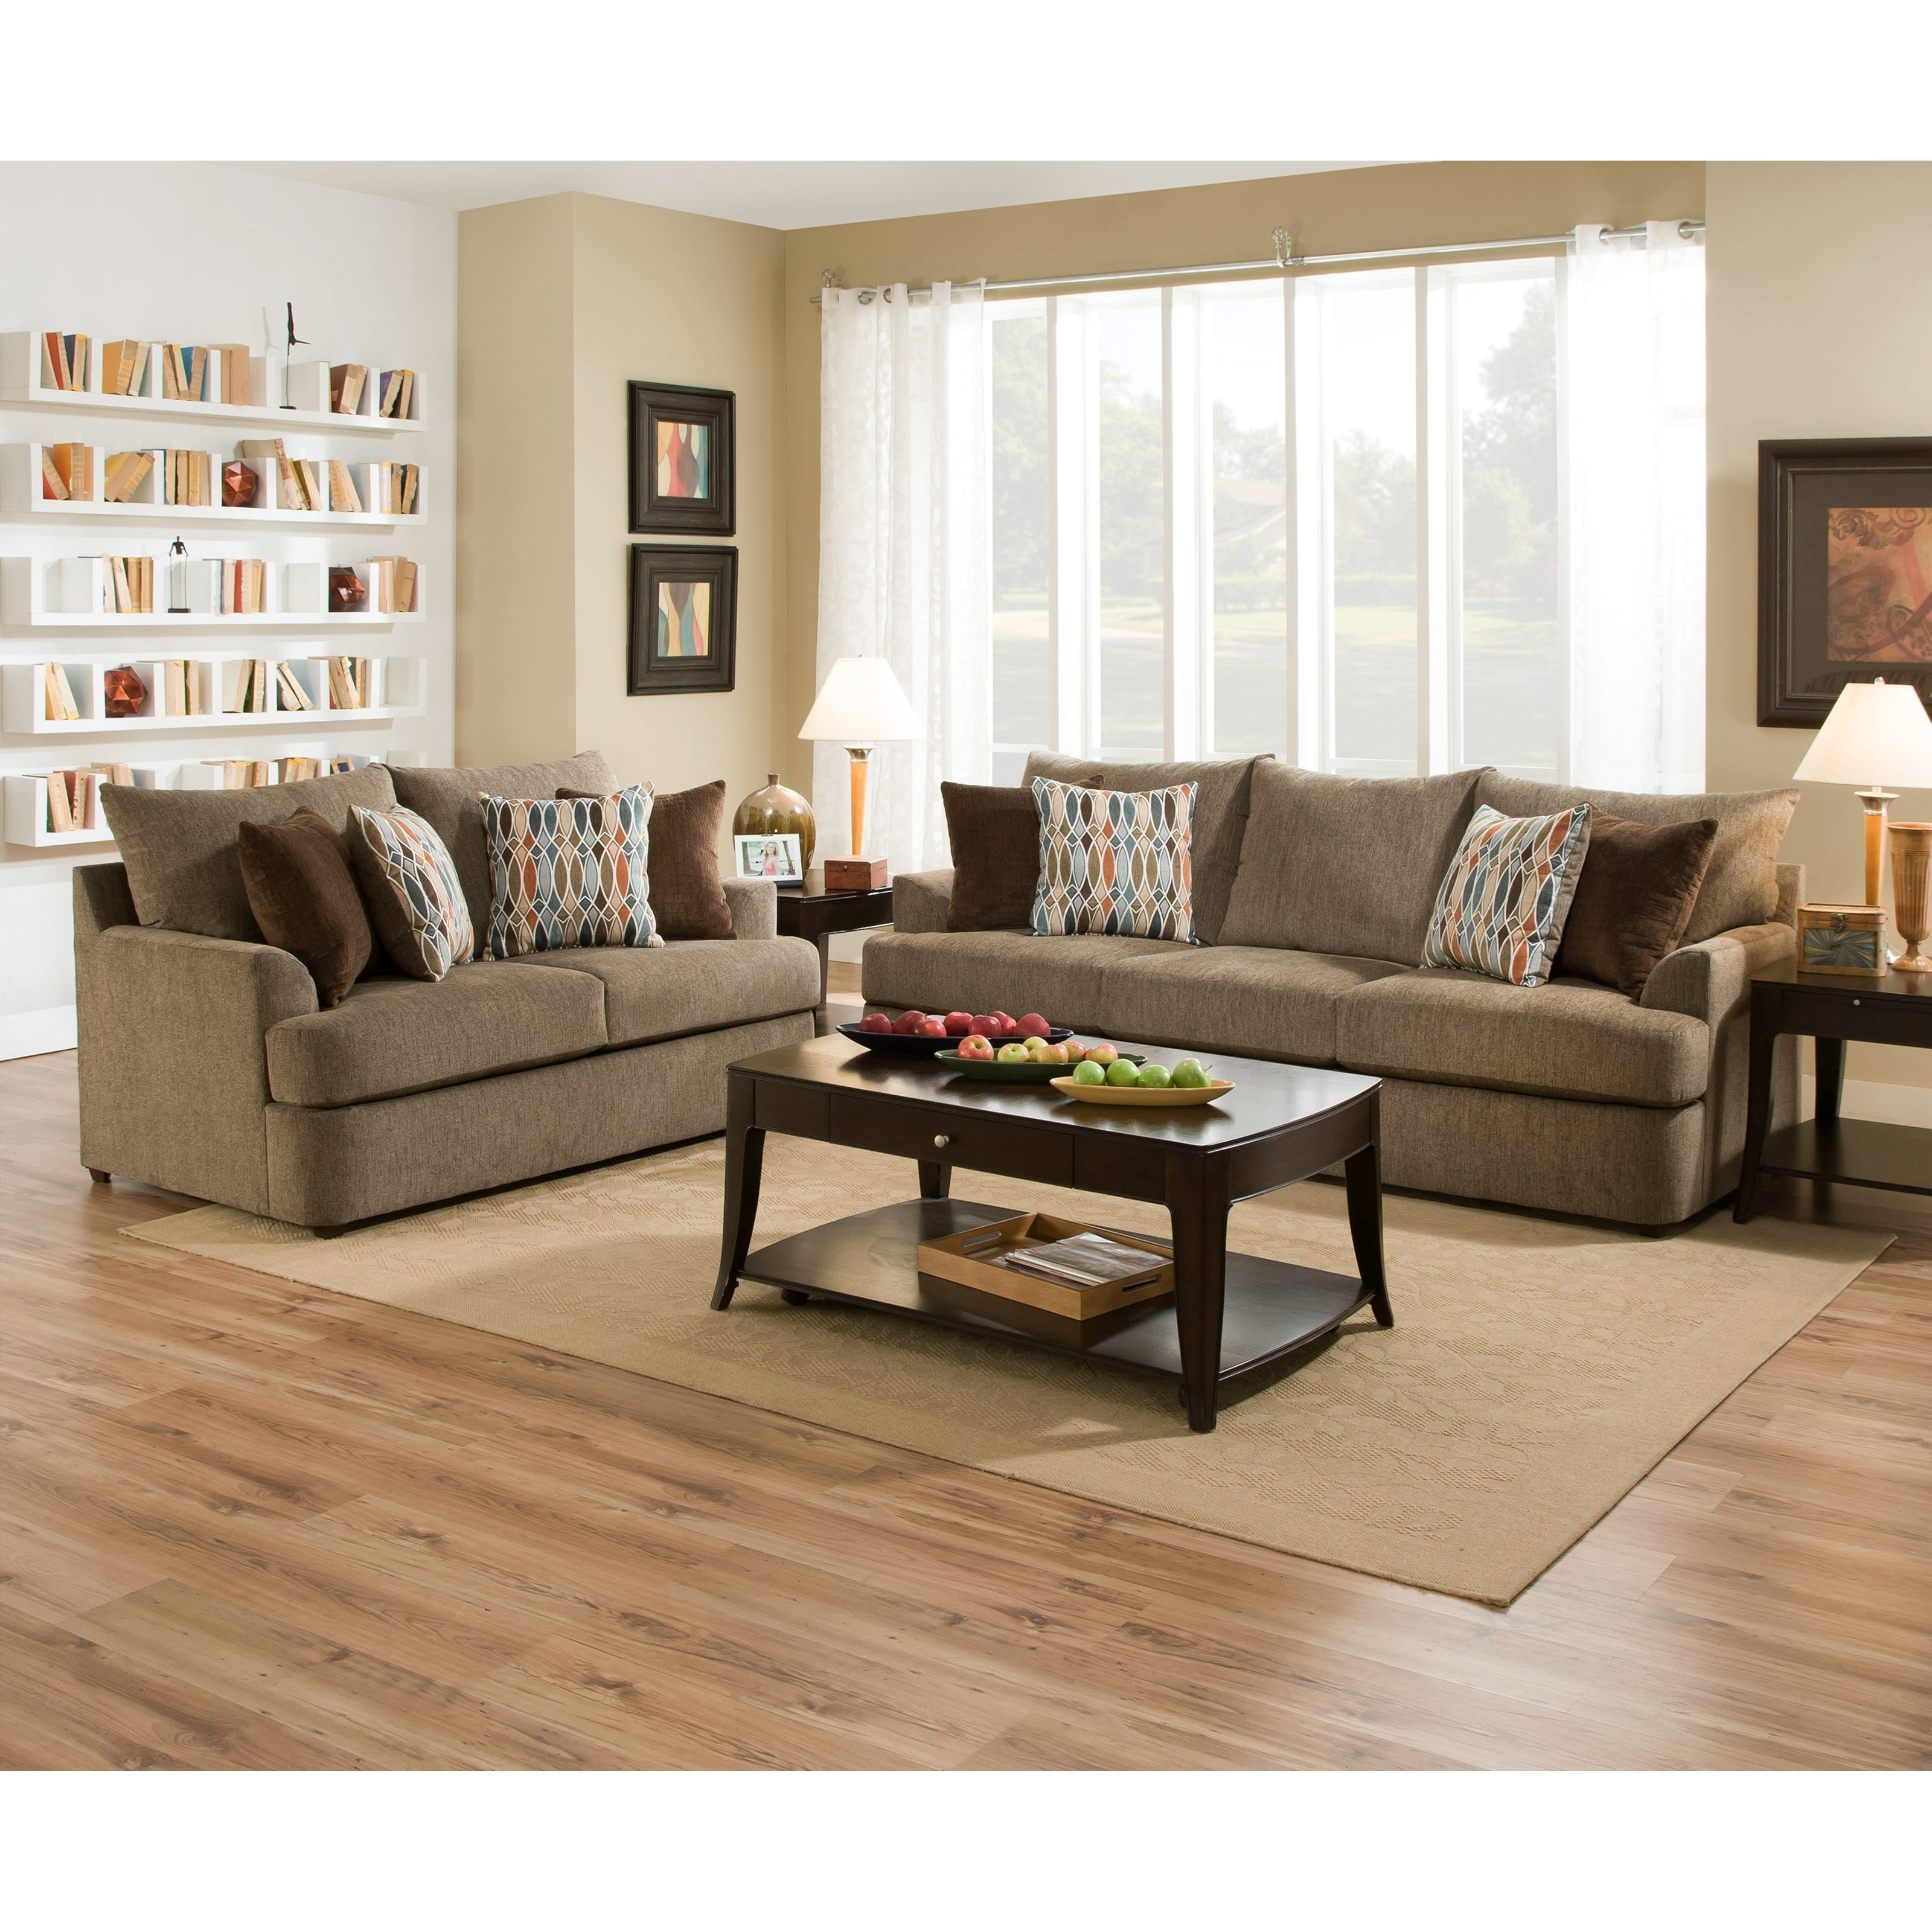 Cargo Brand Furniture: United Furniture Industries 8540BR 8540BRSOFA Casual Sofa